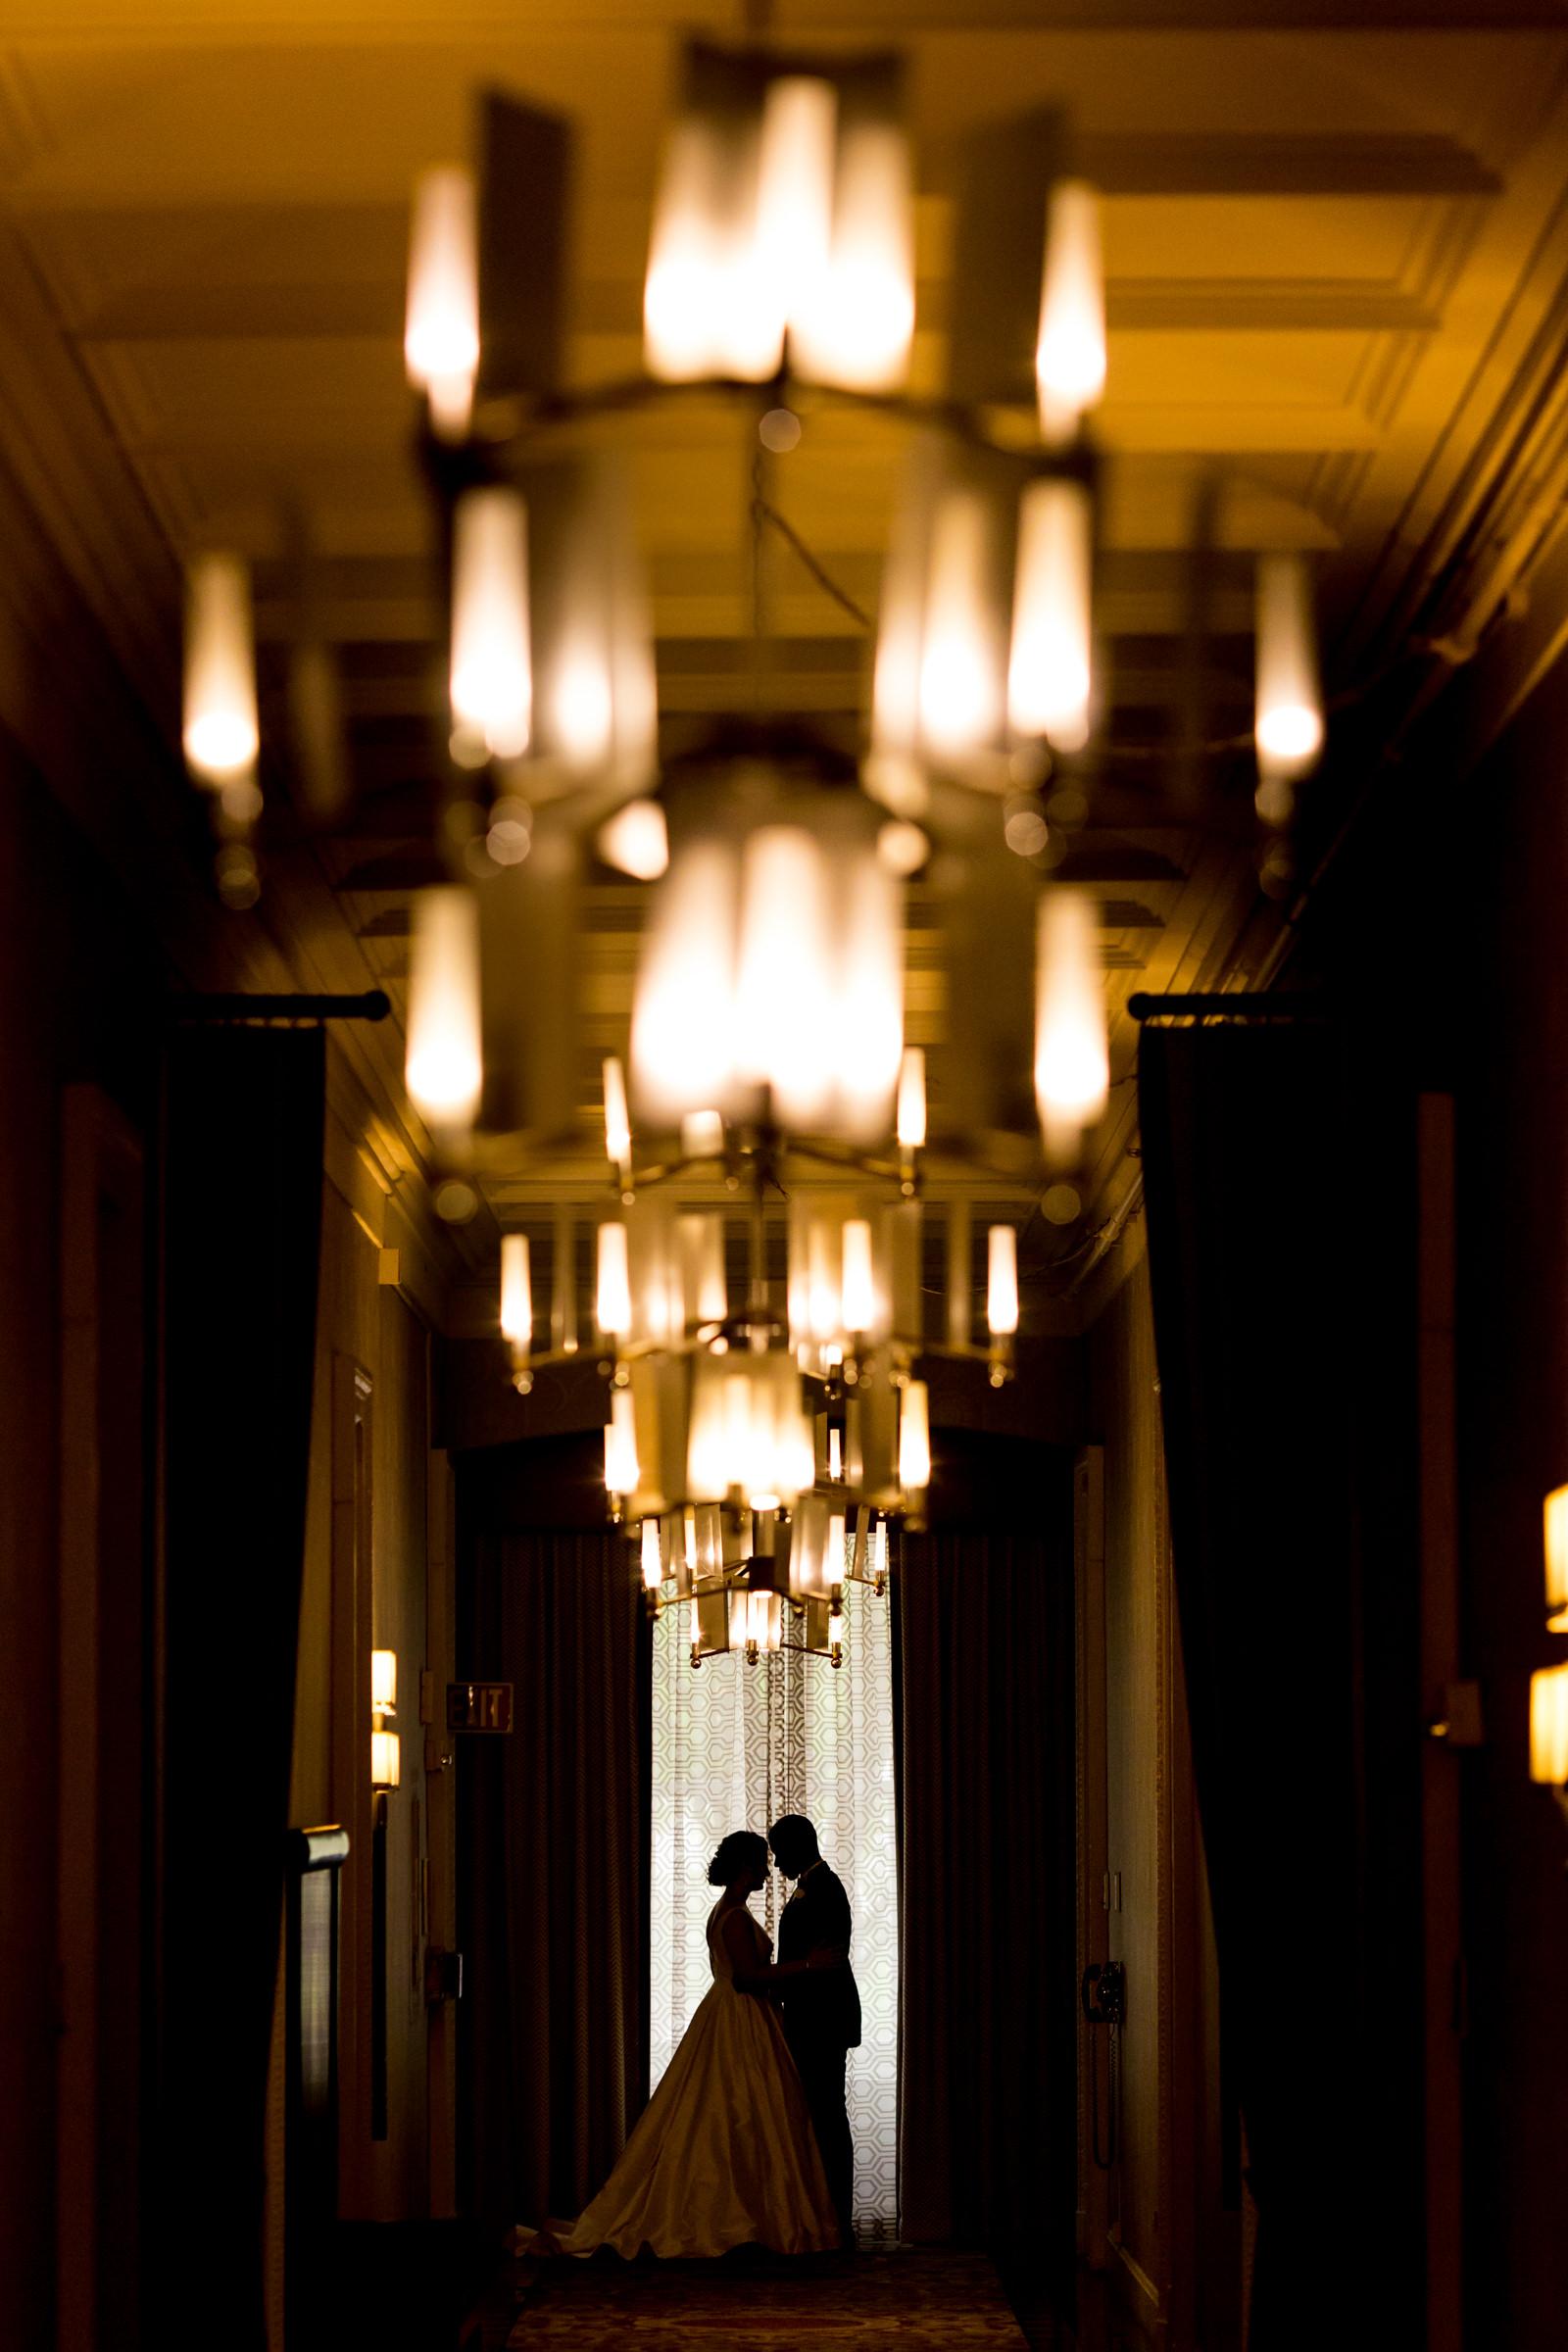 Silhouette couple portrait against chandeliers - photo by Procopio Photography